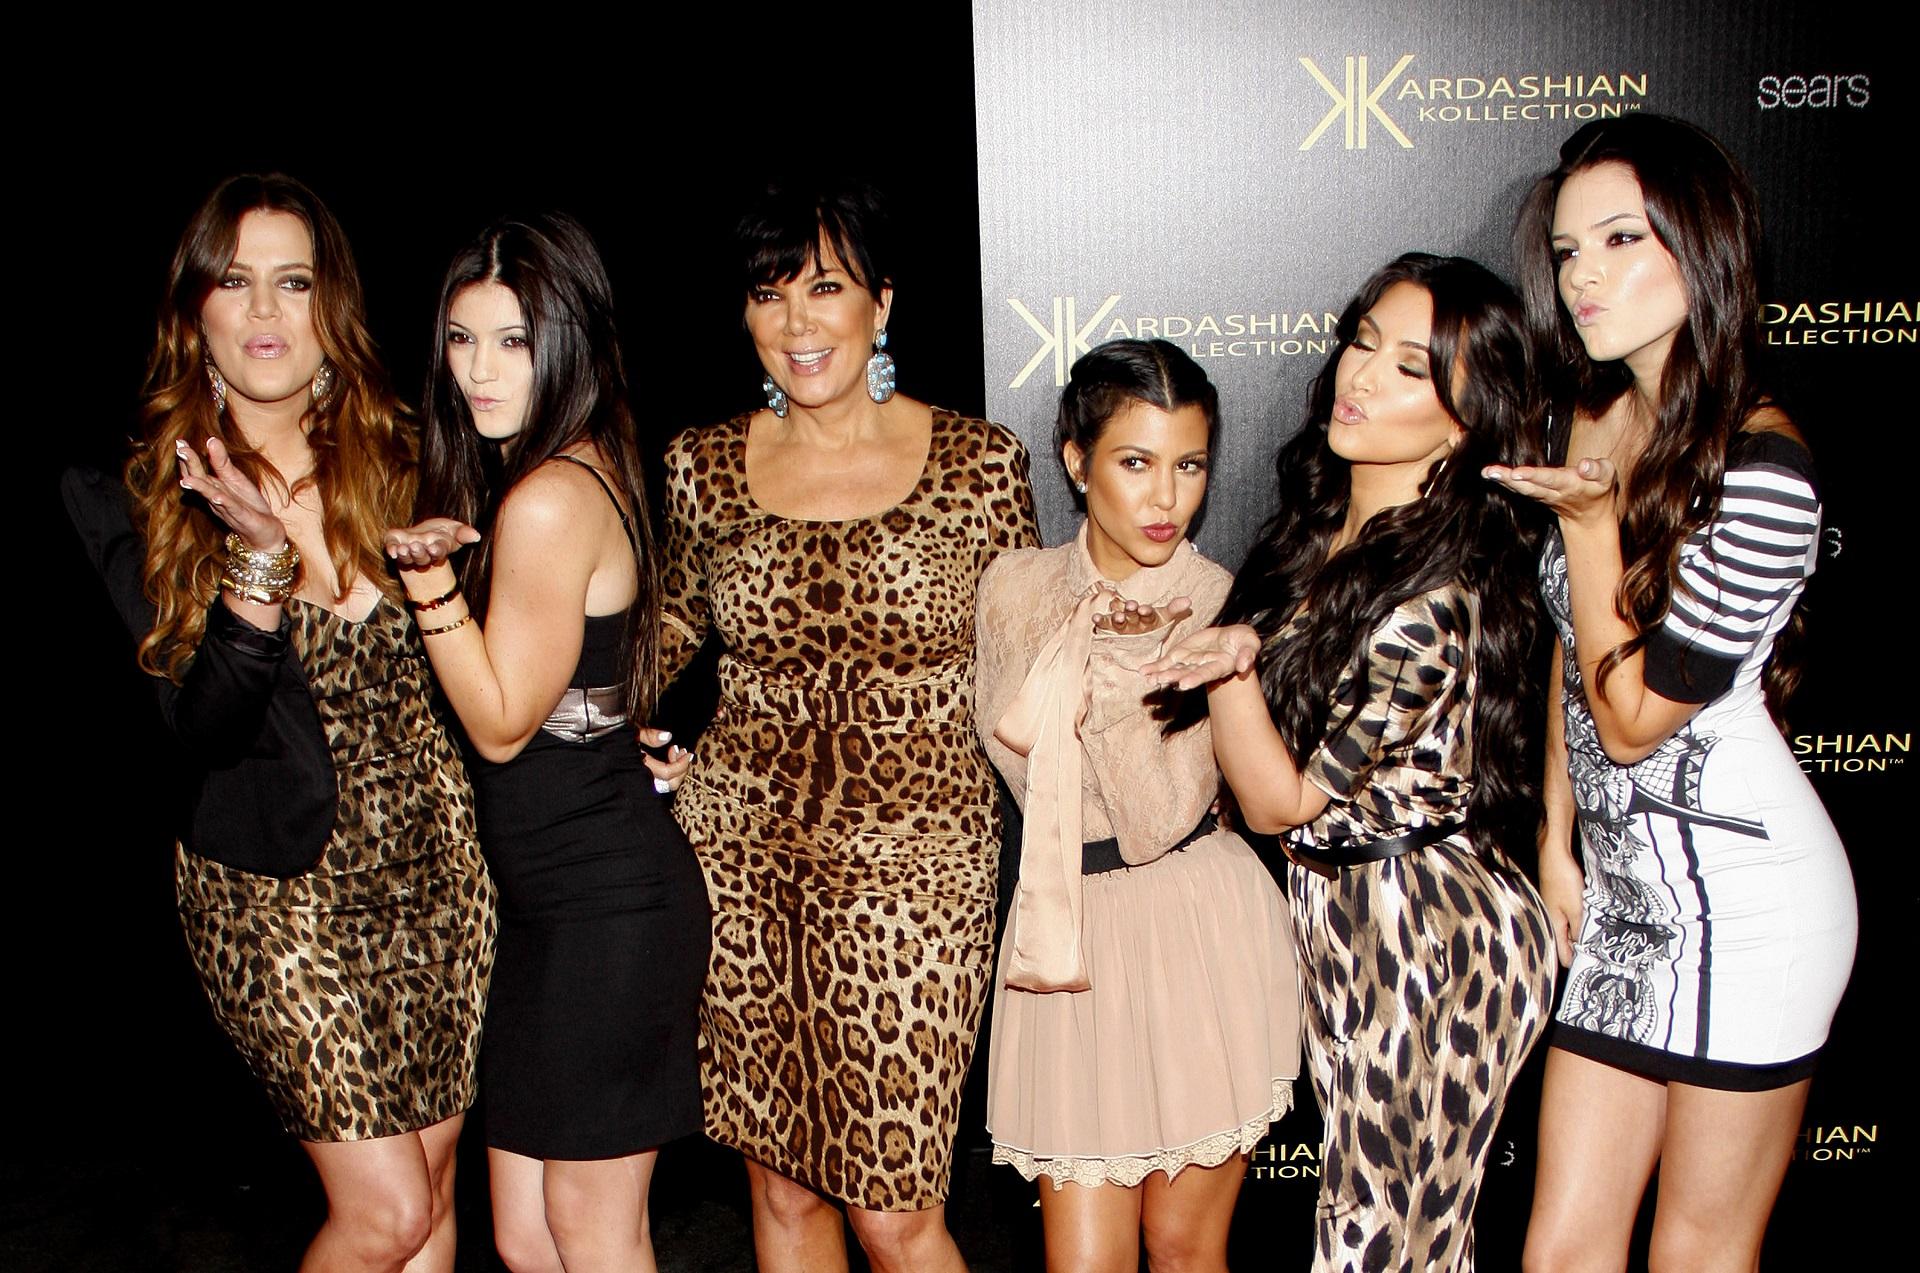 How to run your business like a Kardashian - blog